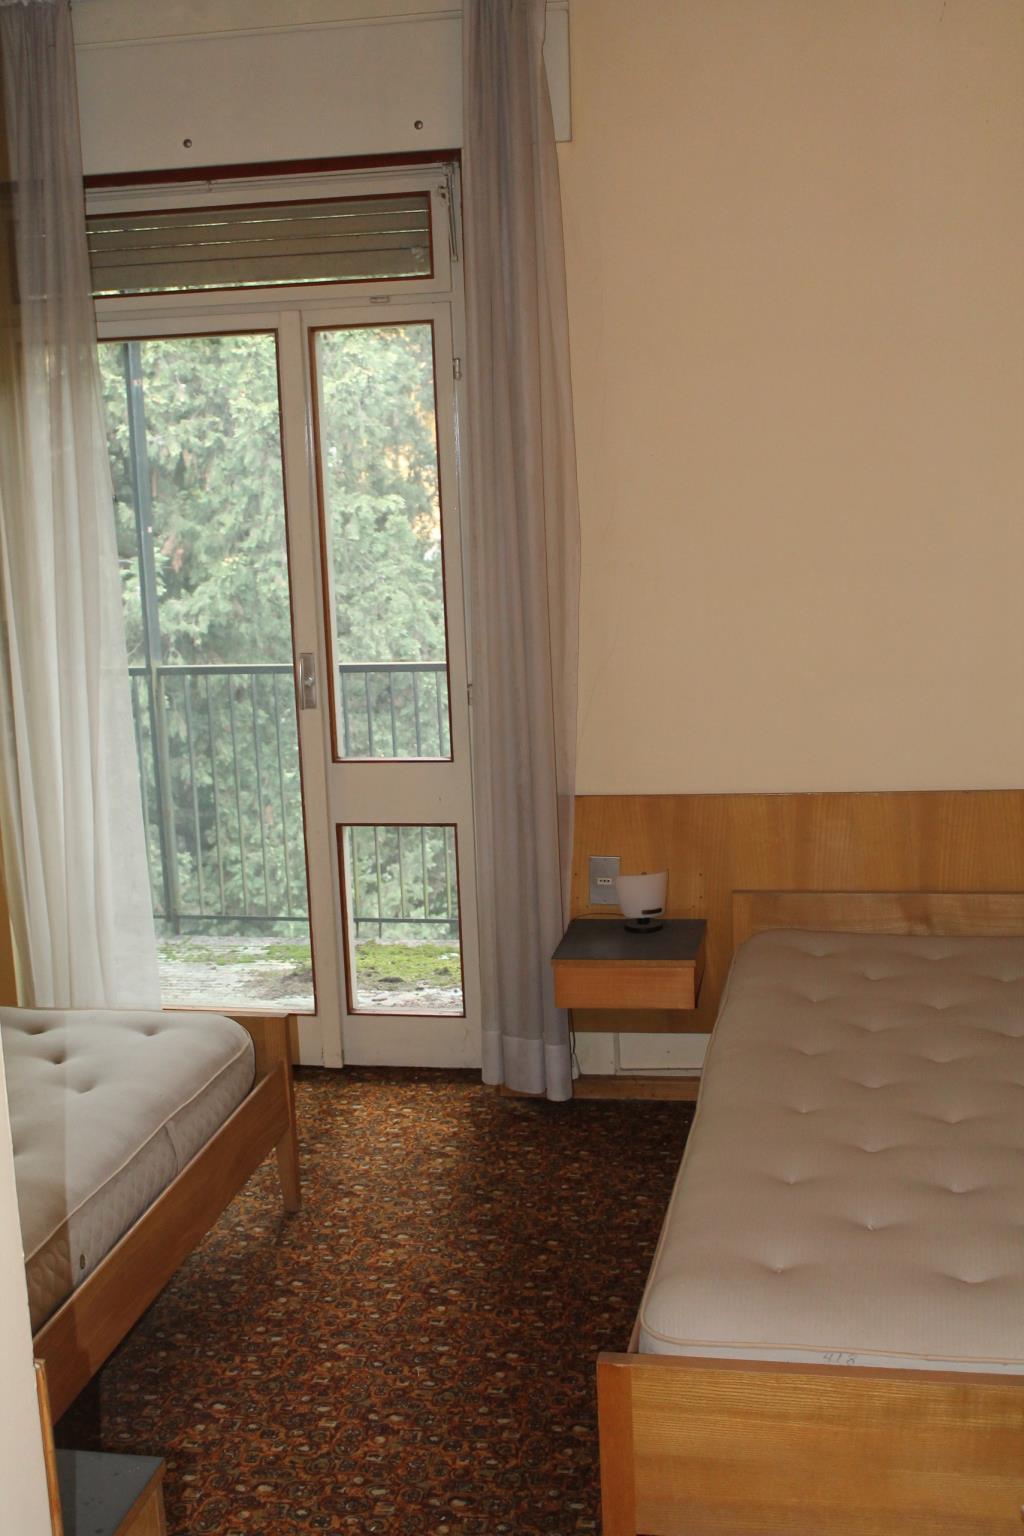 Bilocale Gardone Riviera Via Al Vittoriale 15 6